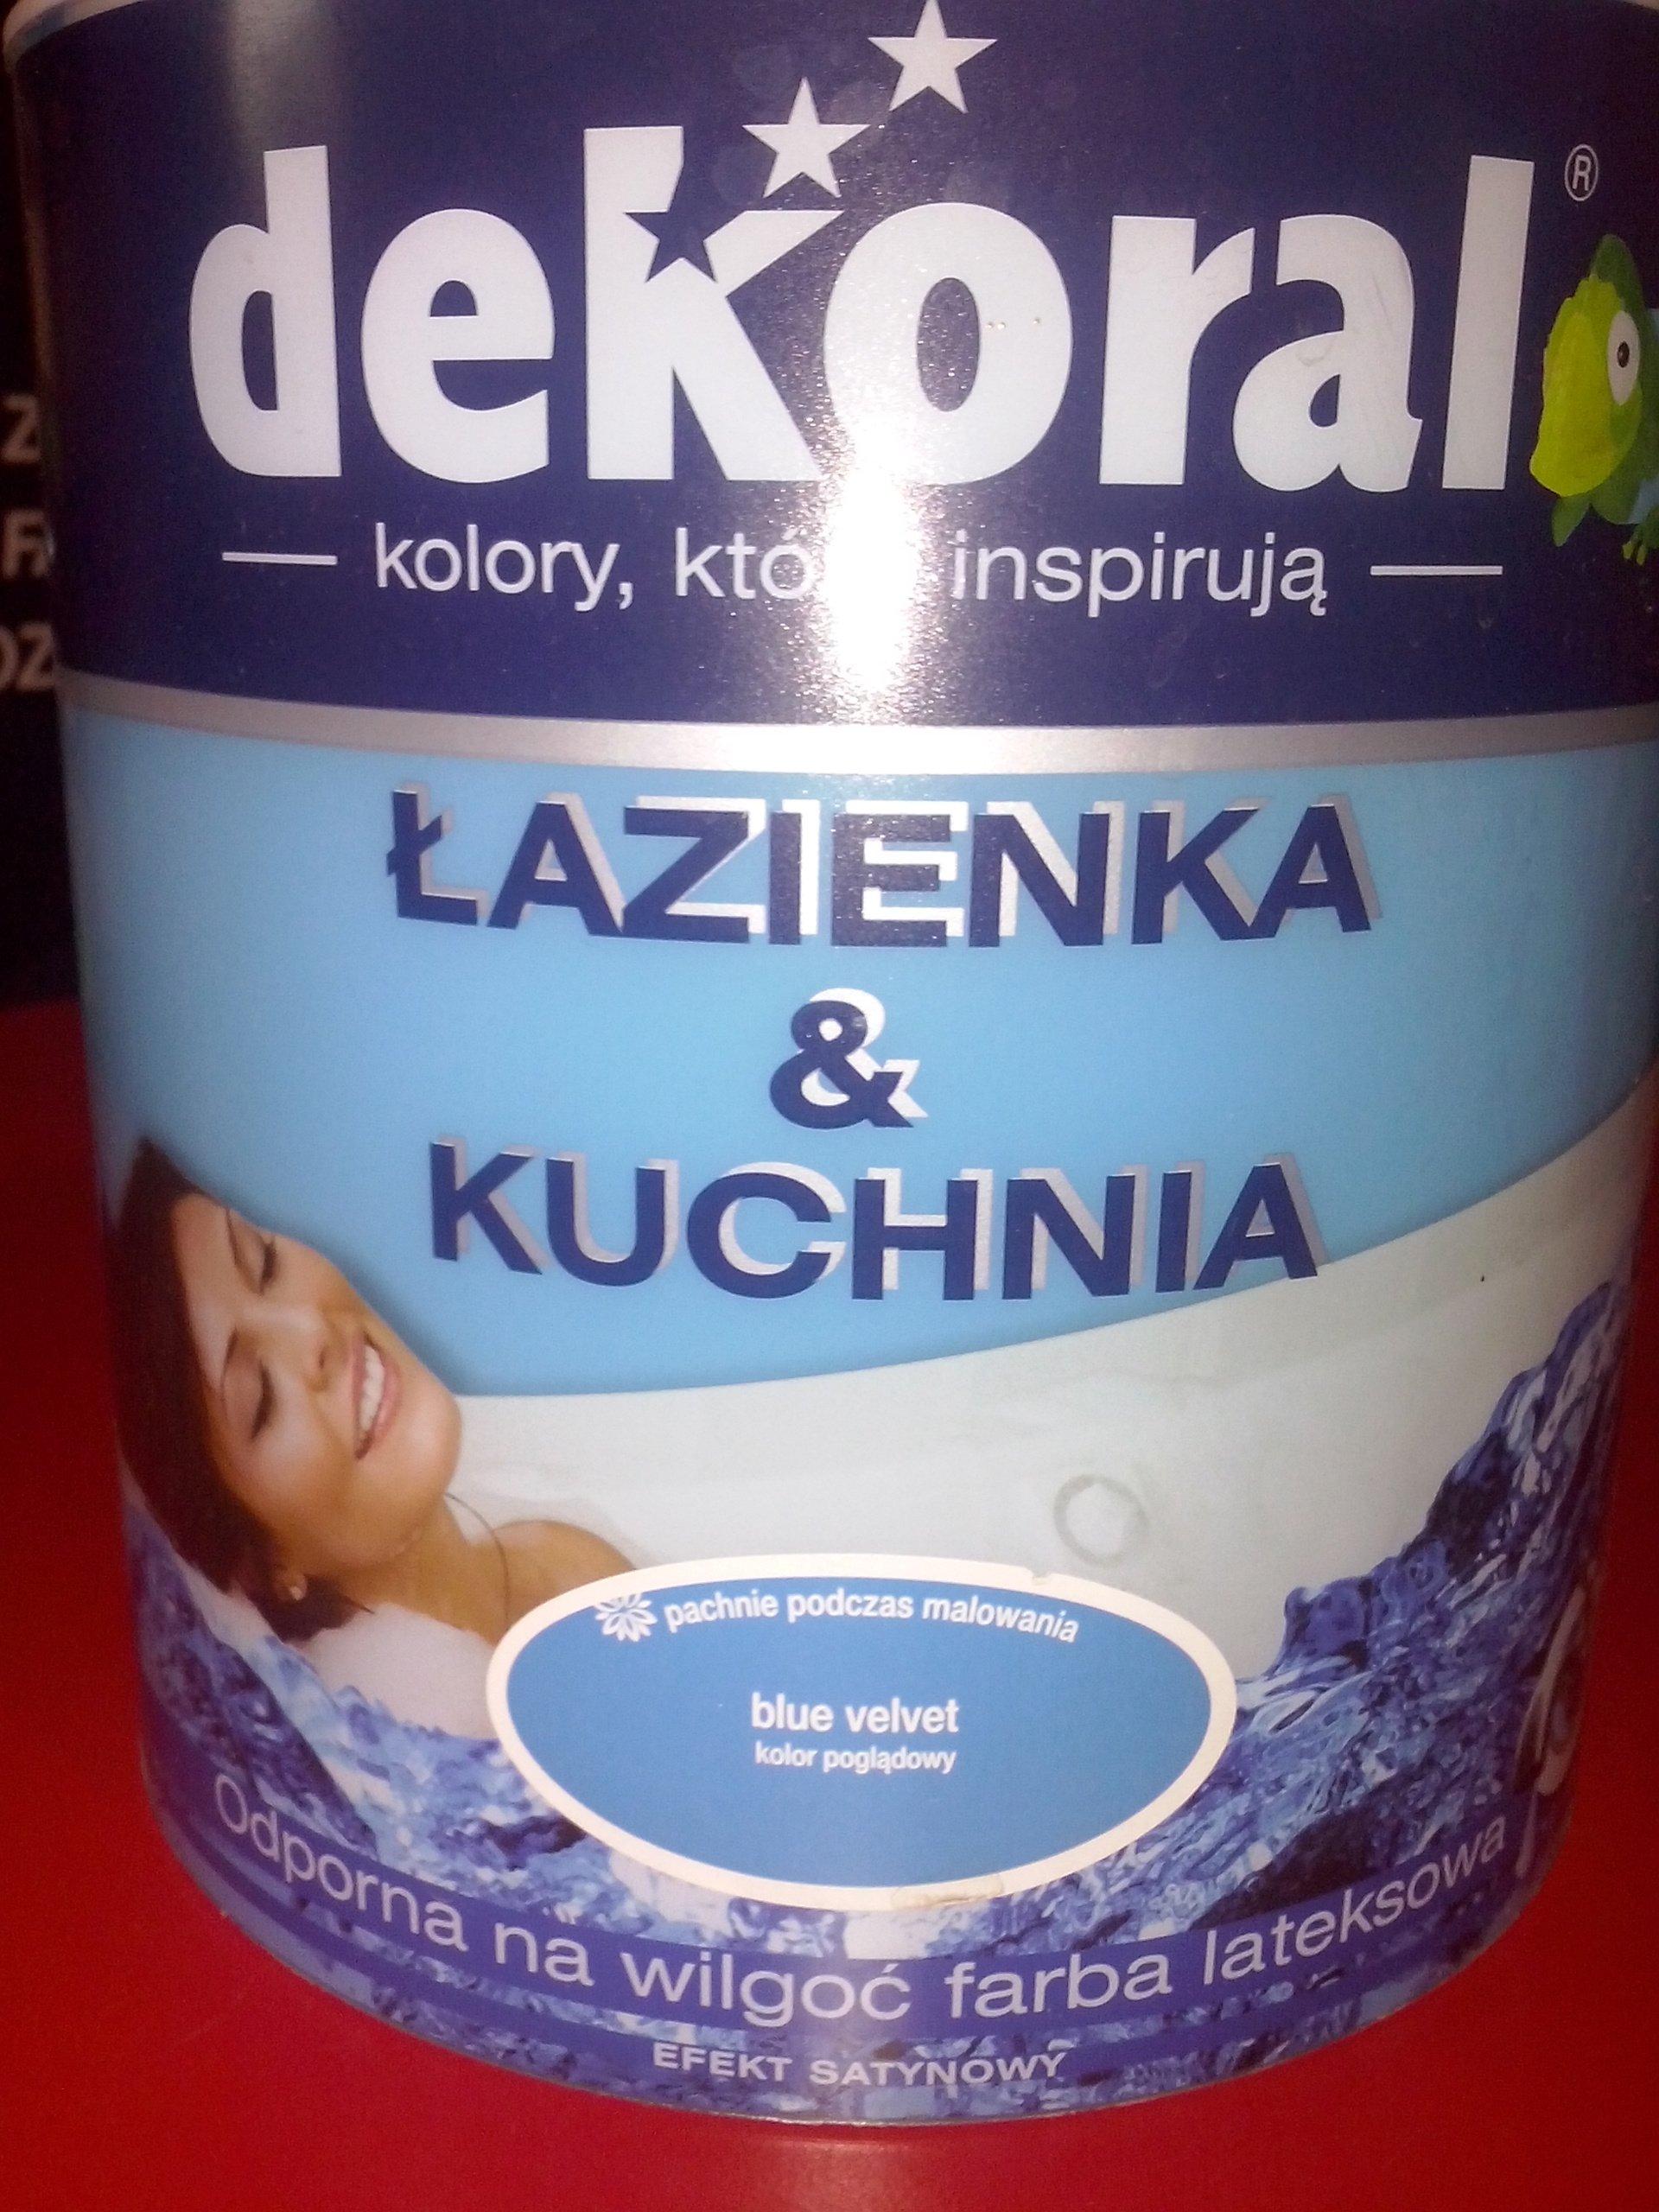 Dekoral Kuchnia łazienka Blue Velvet 25l 60 7183166008